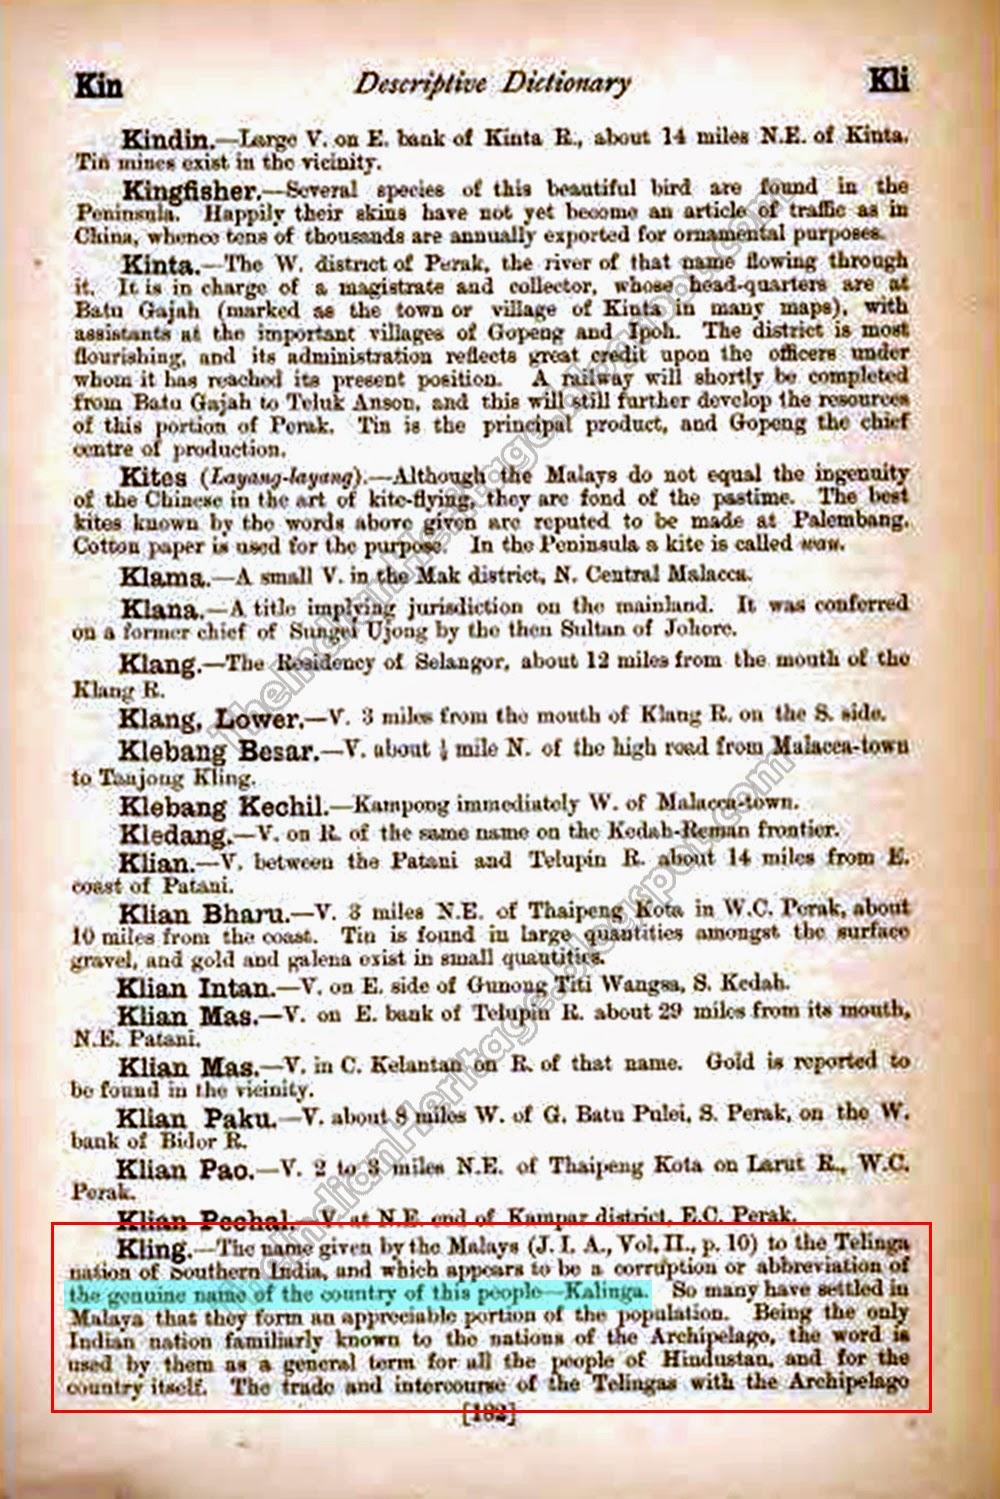 List of English words of Dravidian origin